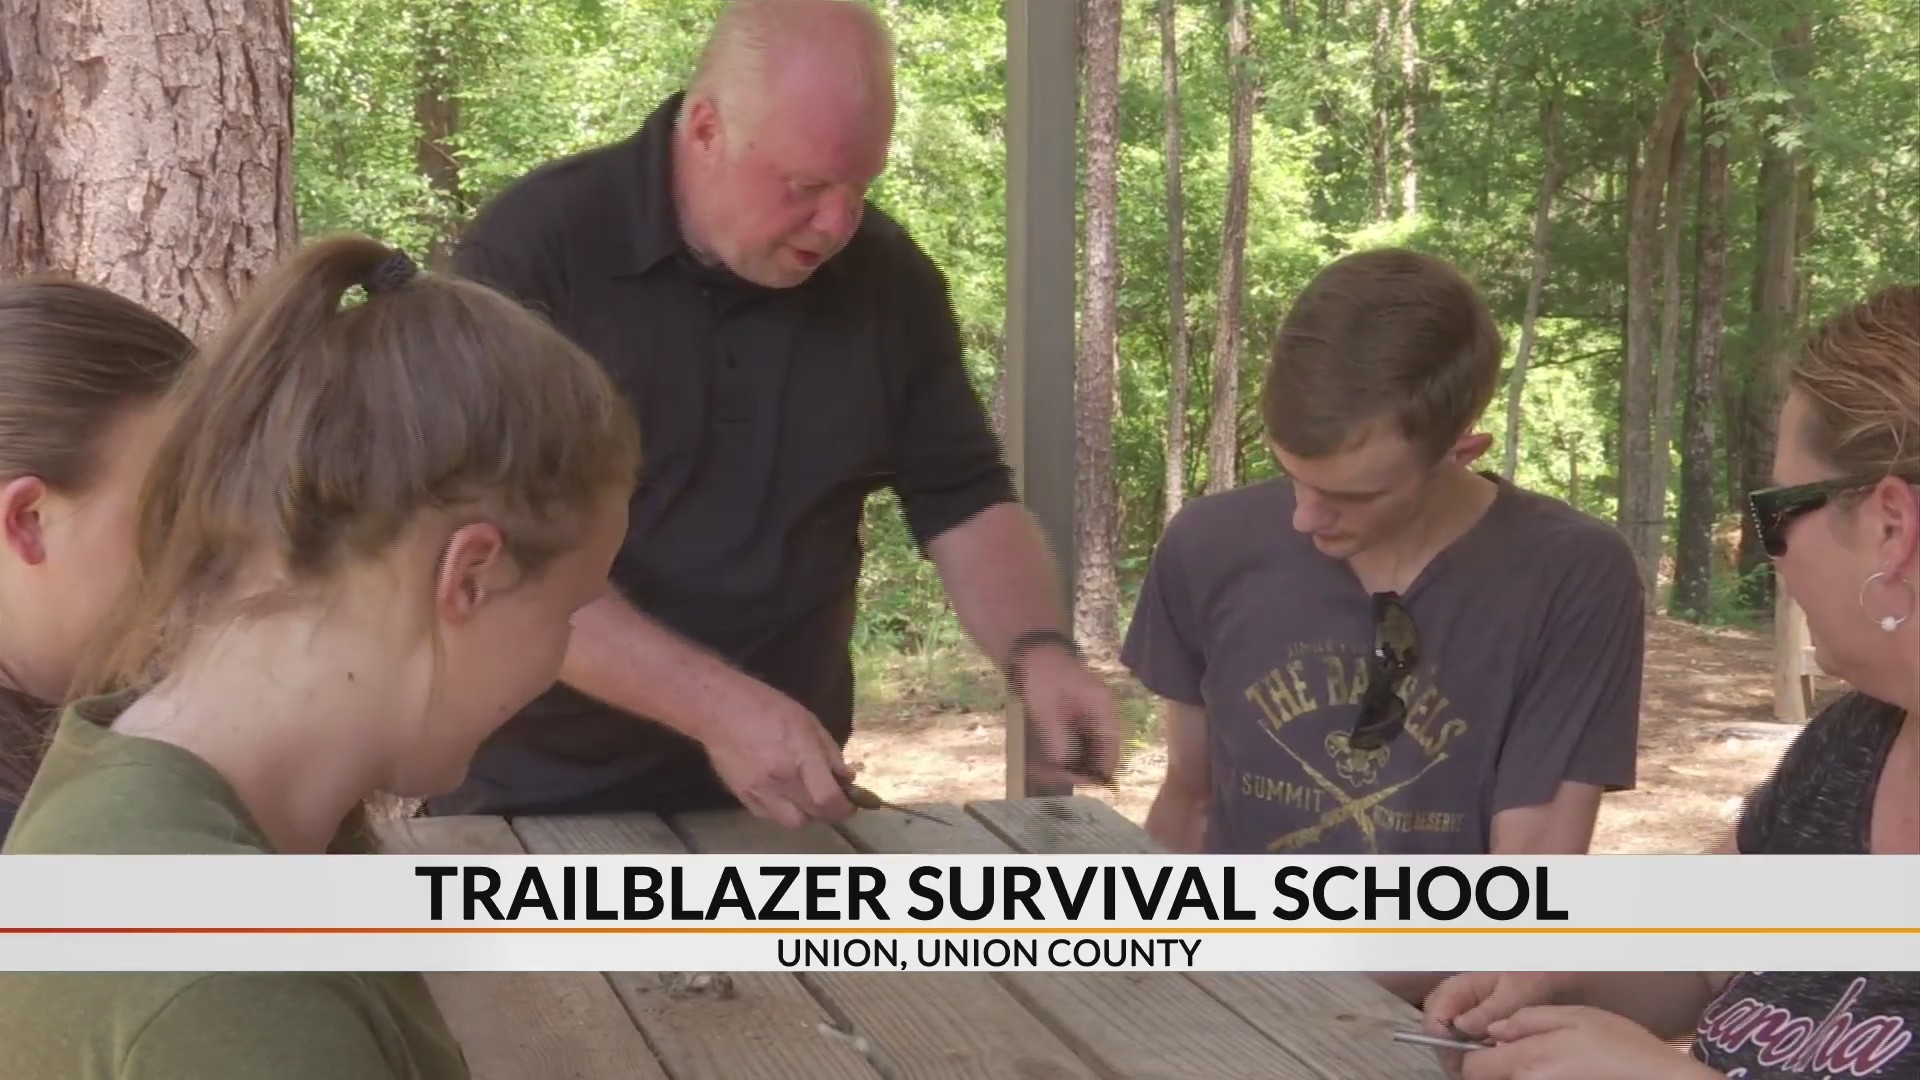 Trailblazer_Survival_School_0_20190529105111